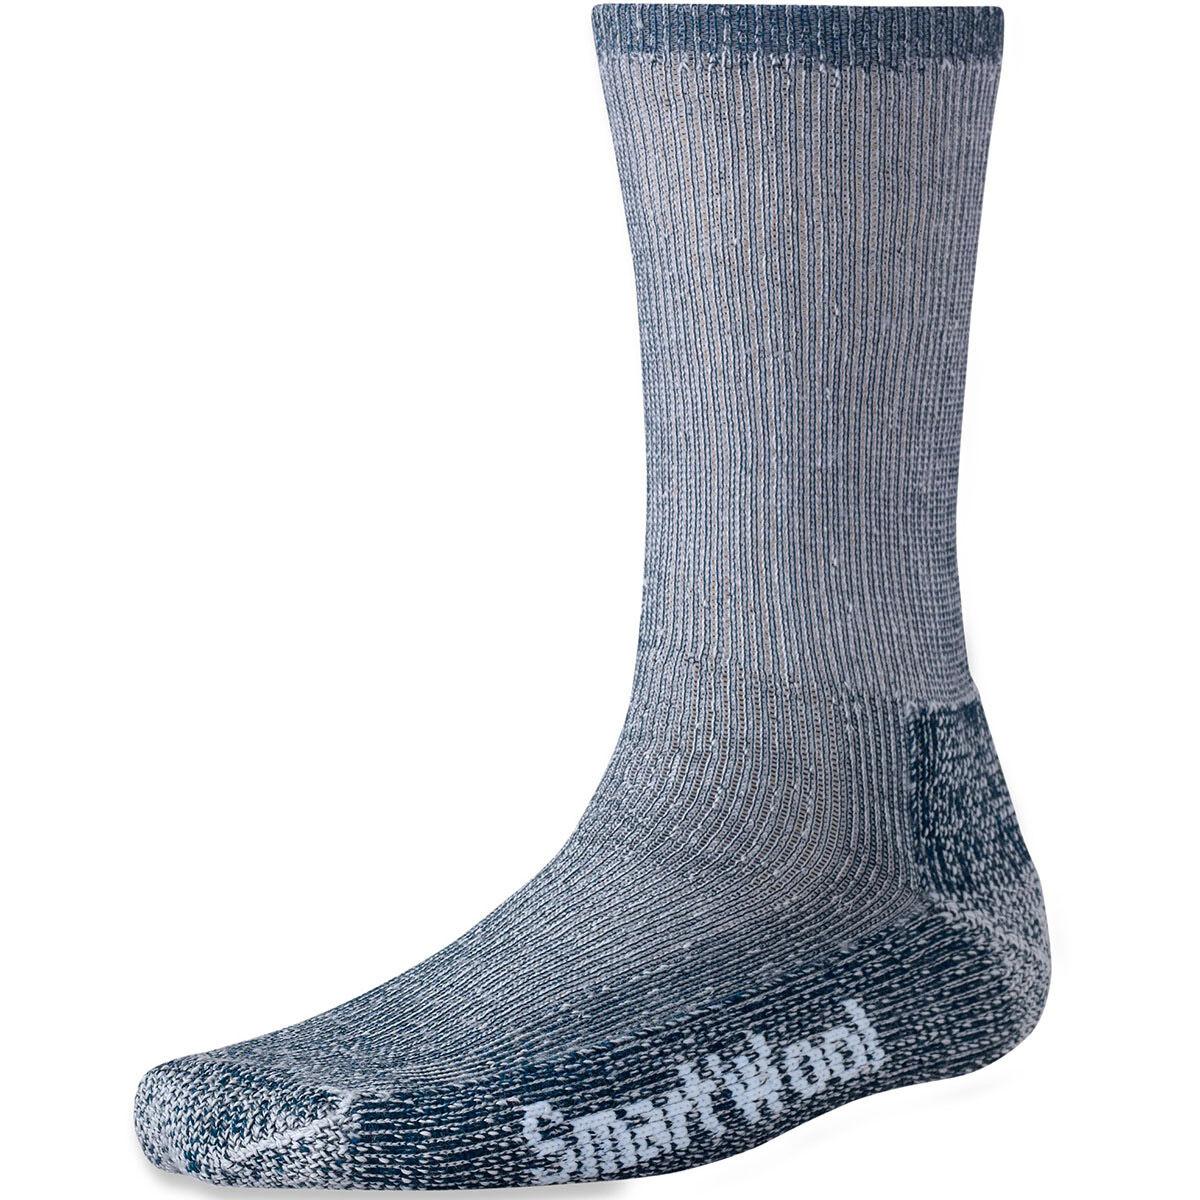 Smartwool Expedition Trekking Socks